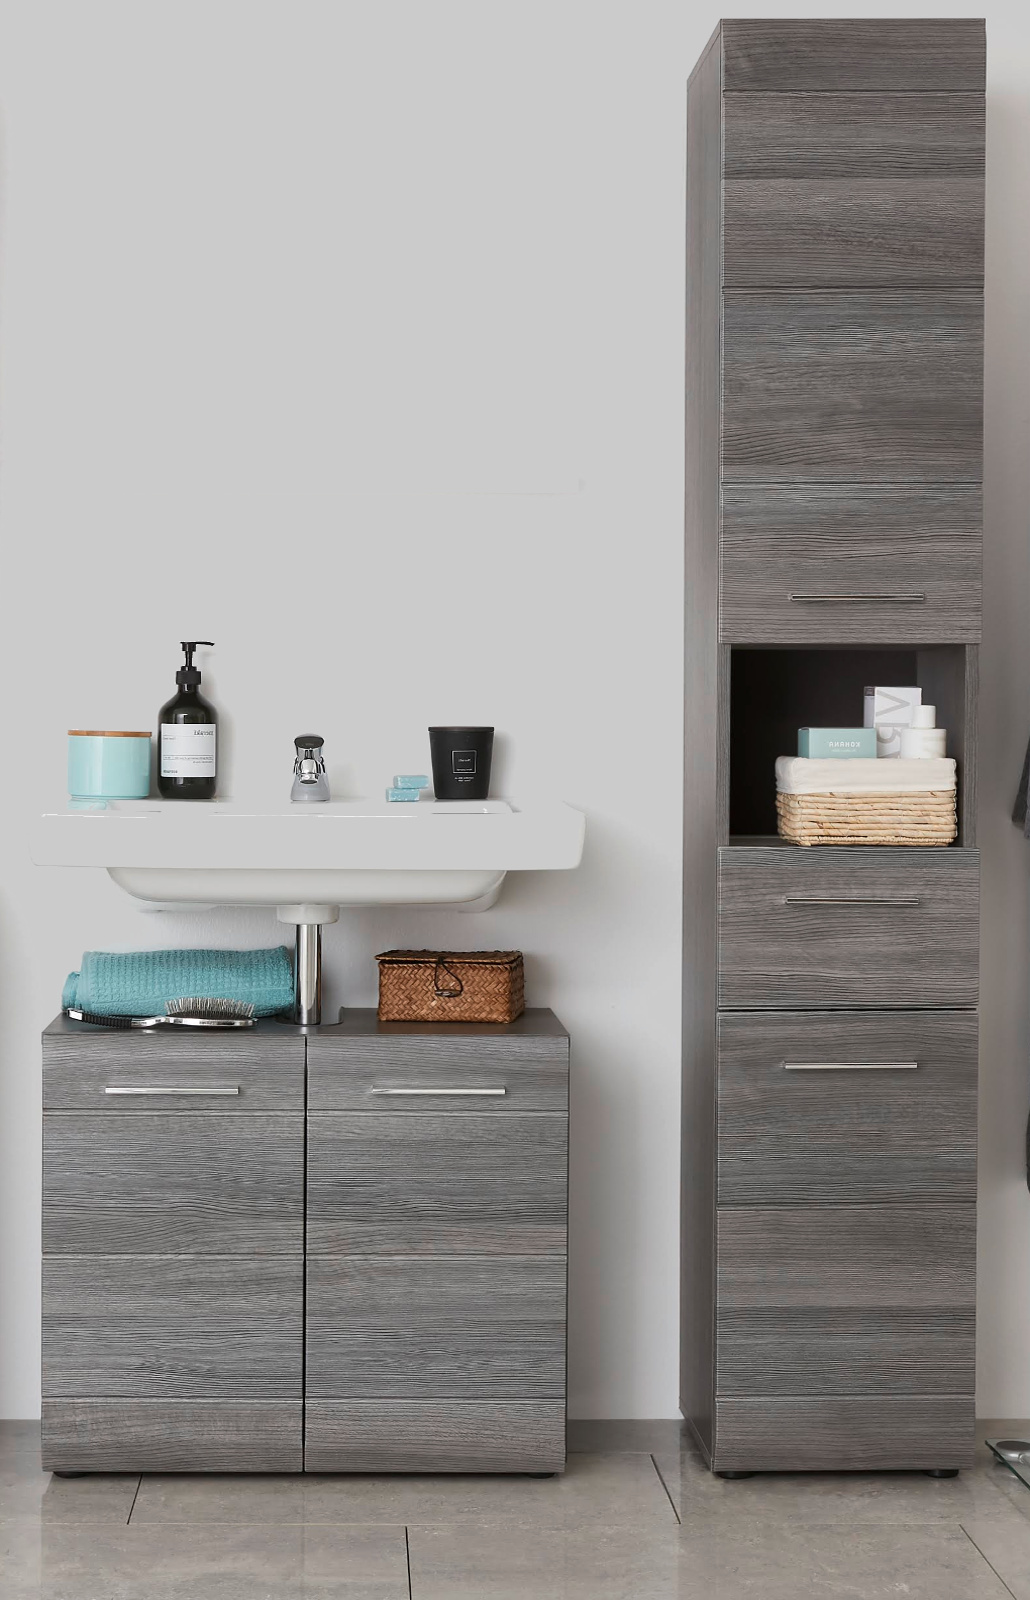 sideboard anrichte aus italien in eiche sonoma melamin designerm bel moderne m bel owl. Black Bedroom Furniture Sets. Home Design Ideas